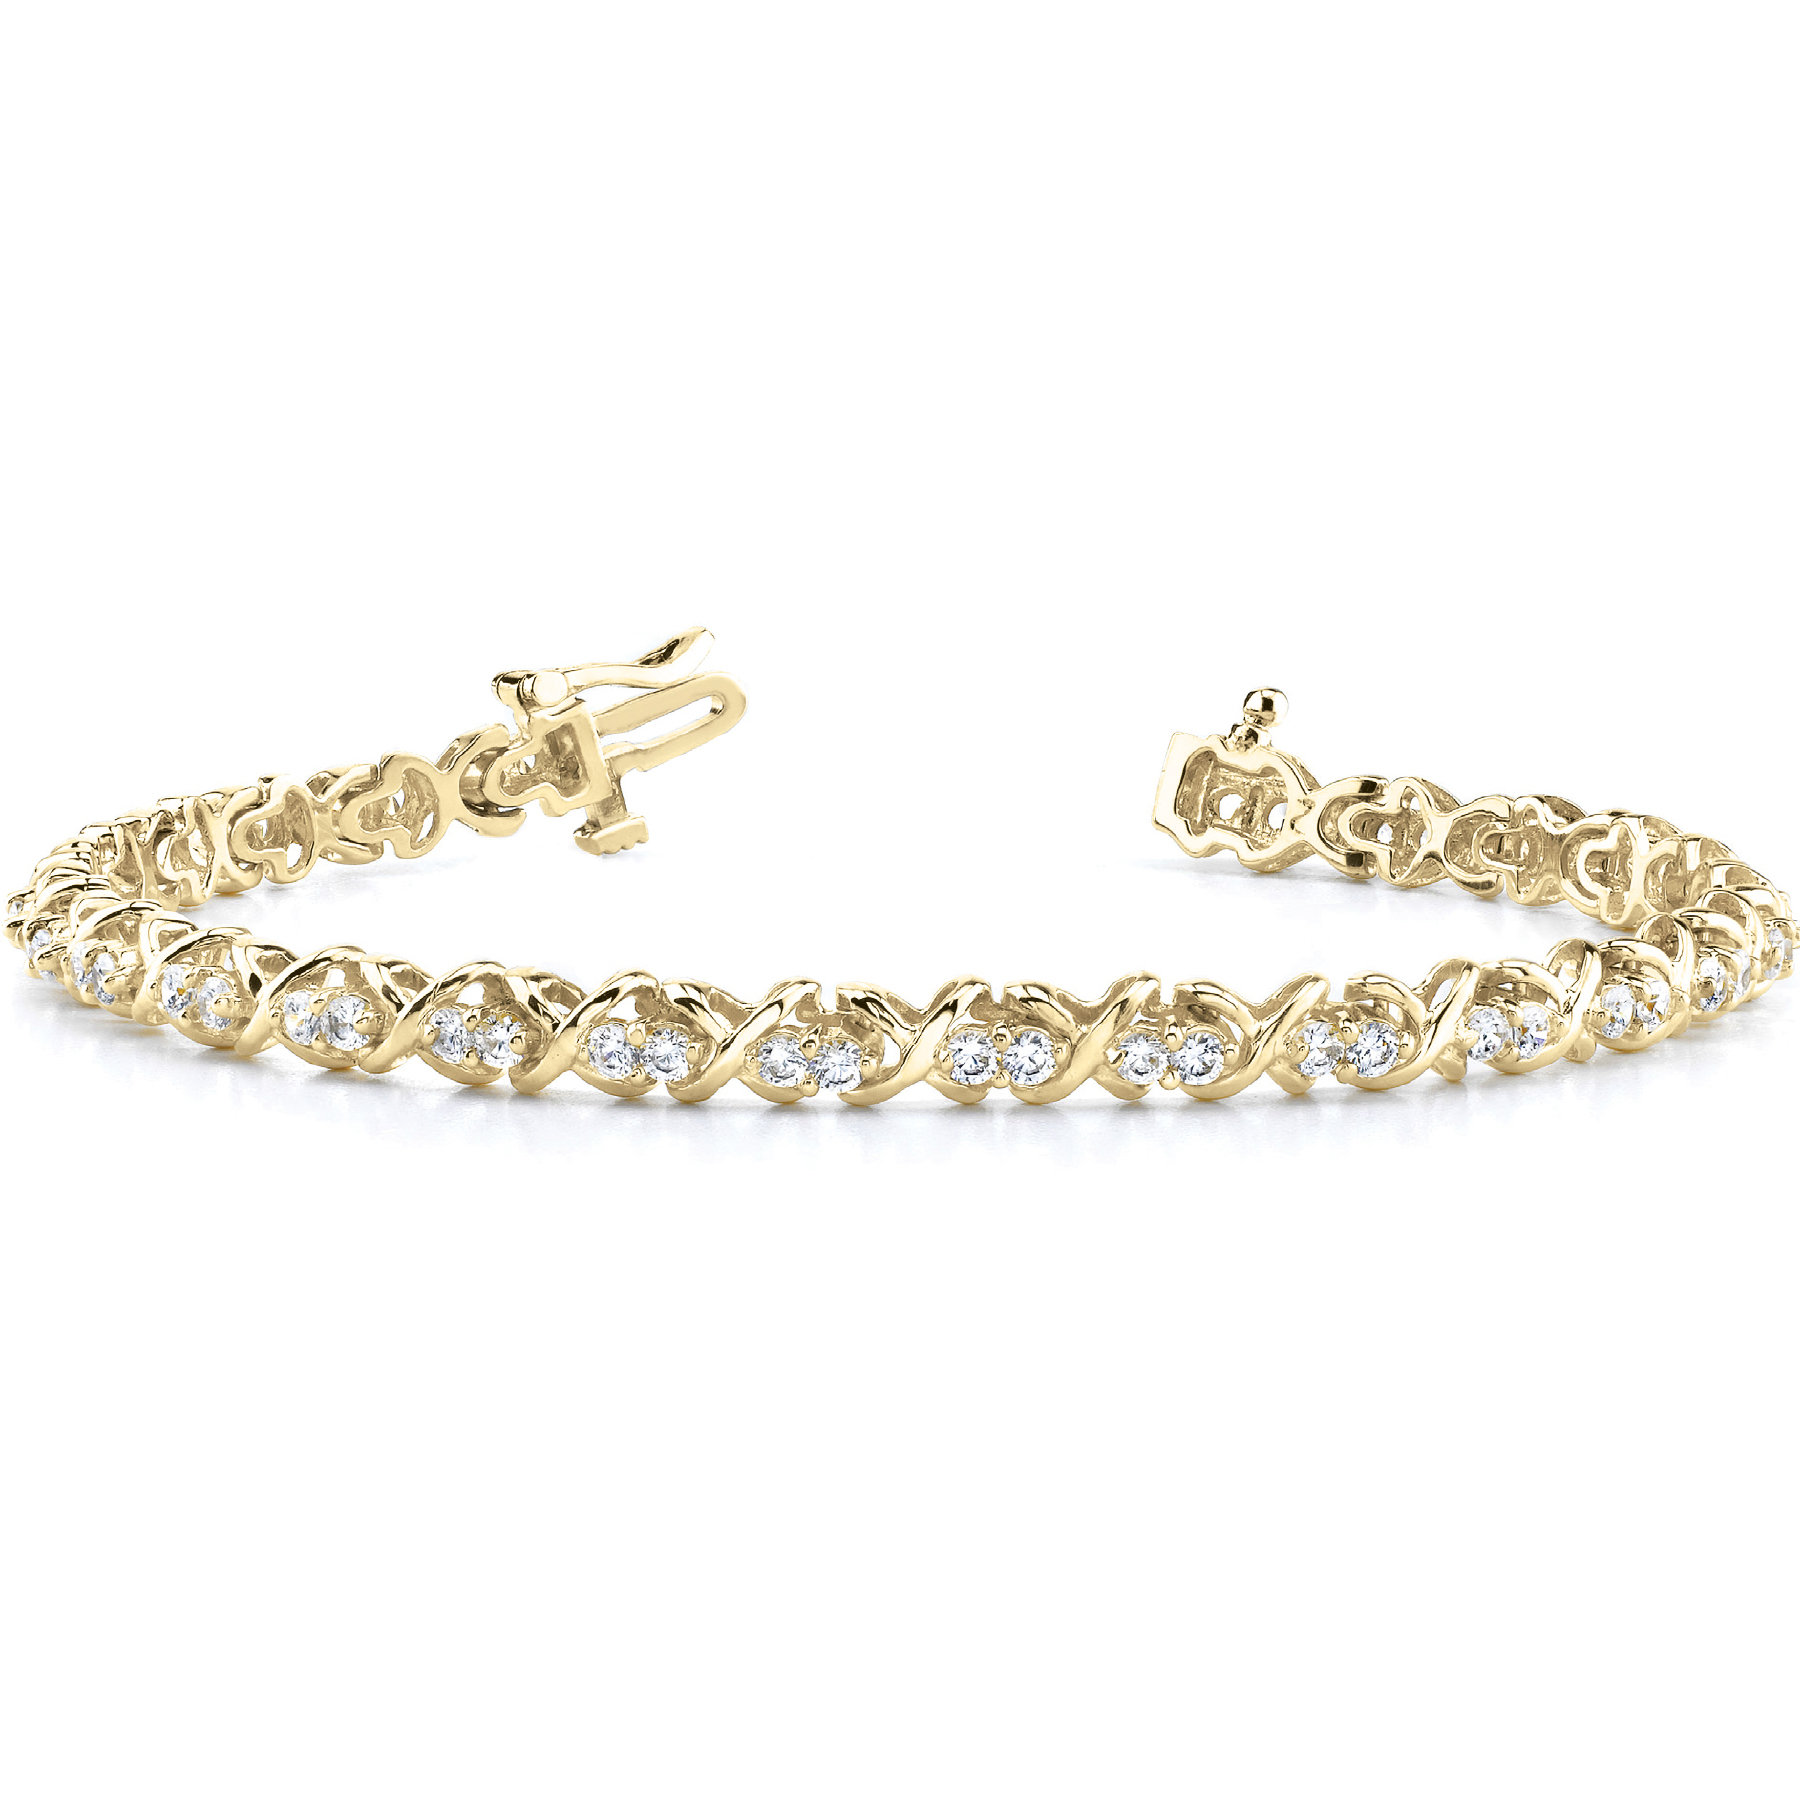 14k-yellow-gold-xo-tennis-diamond-bracelet-4485-01-25